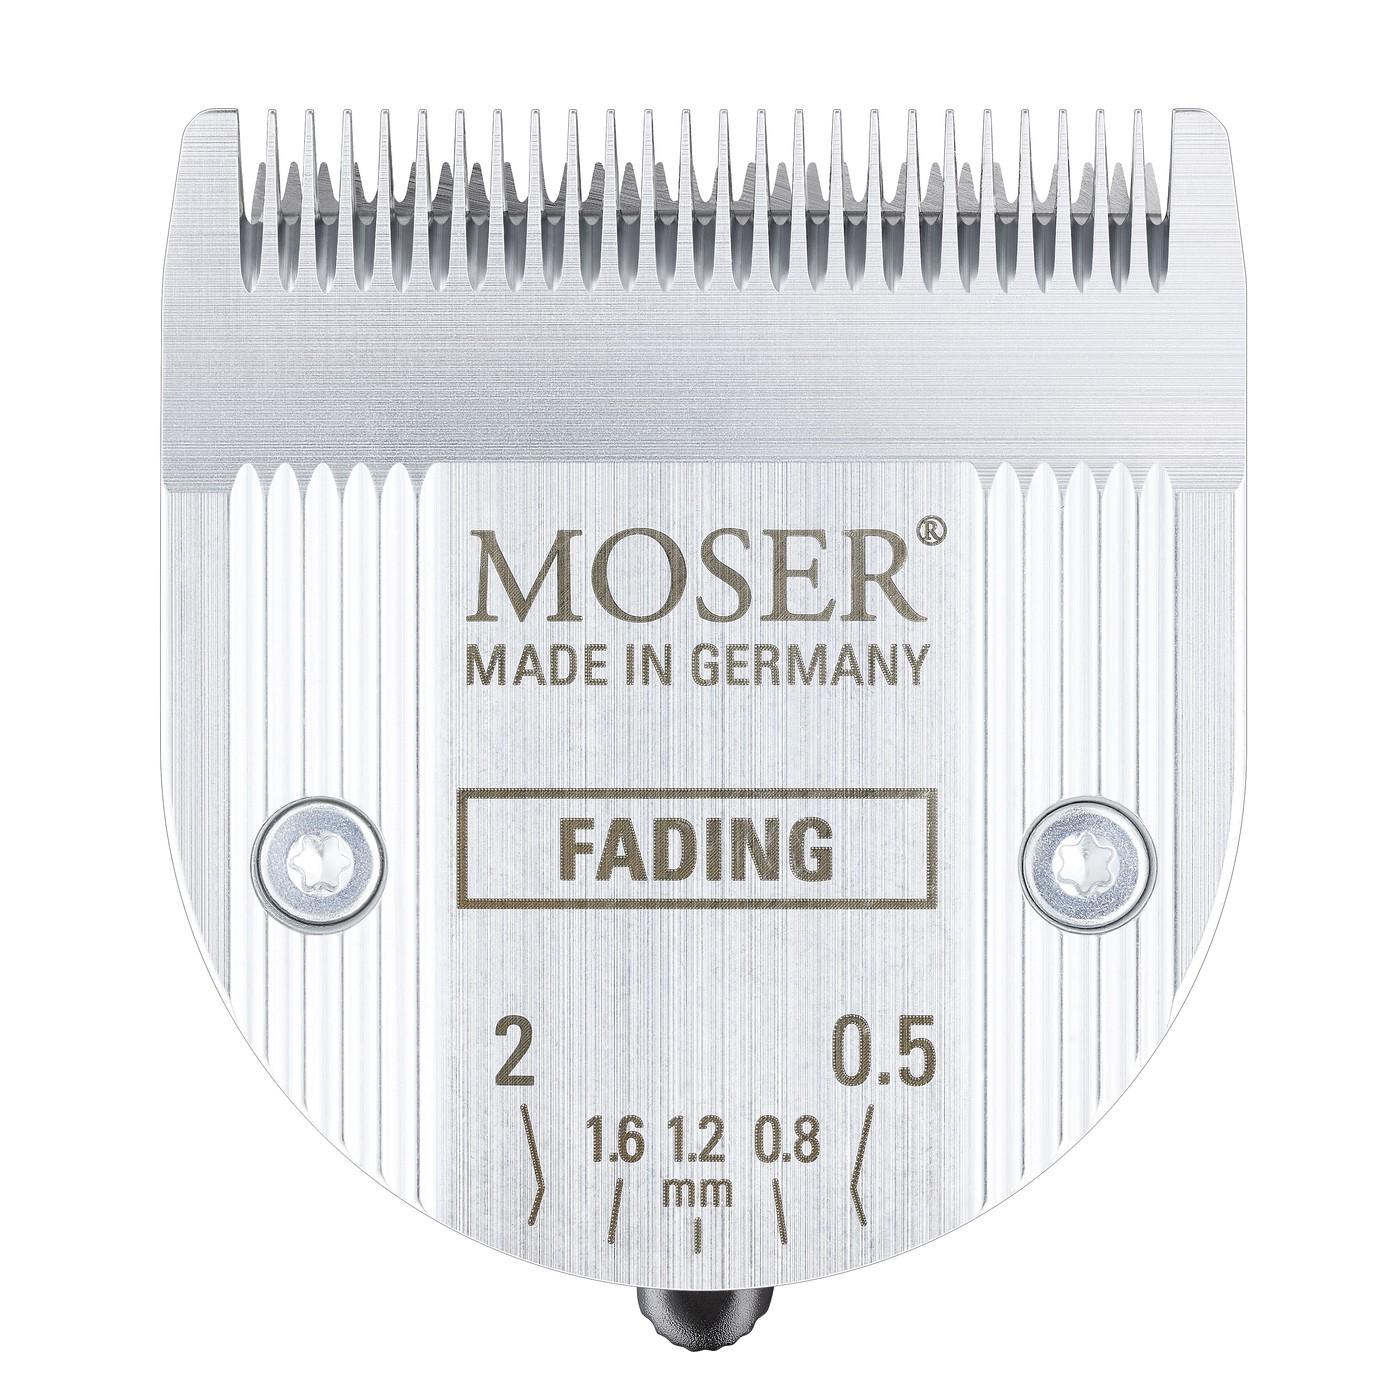 MOSER 1887-7020Fading Blade